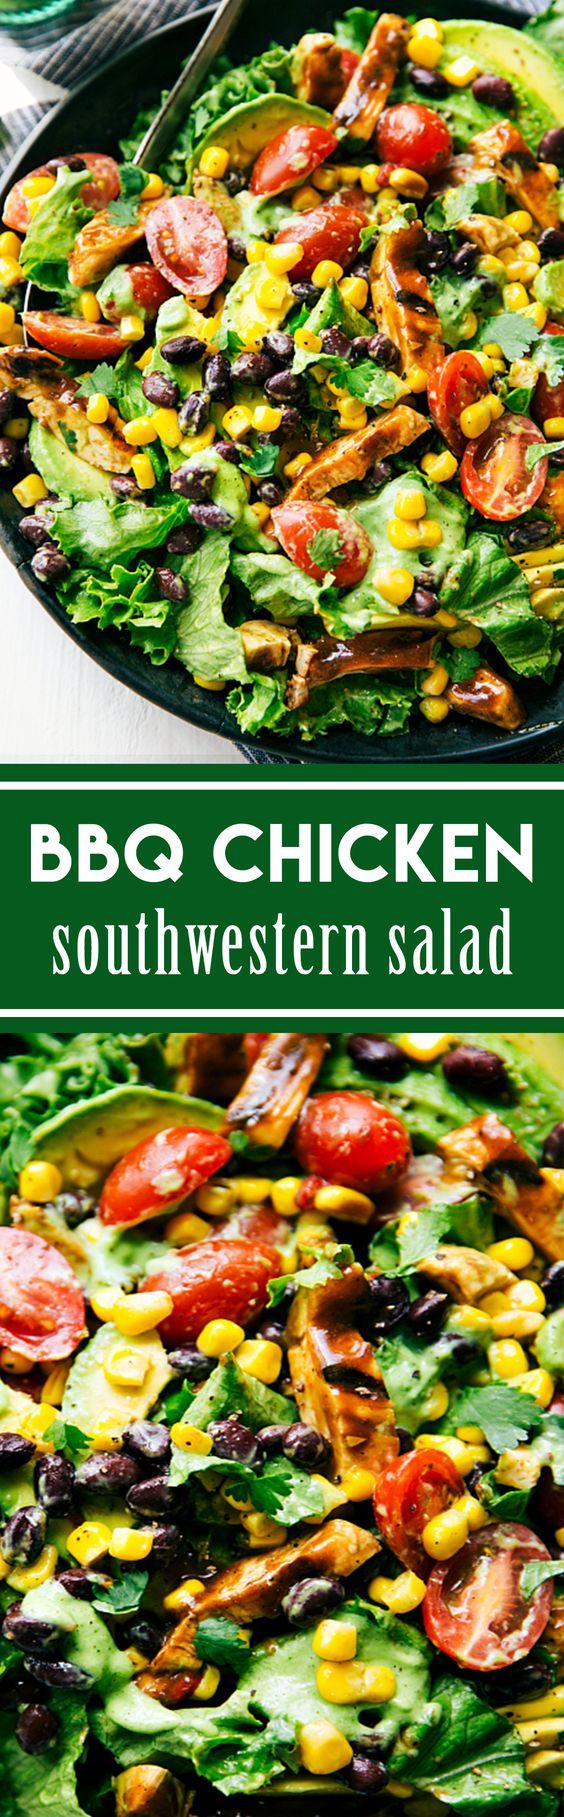 Chicken Salad with Avocado Cilantro Dressing   Recipe   Bbq Chicken ...